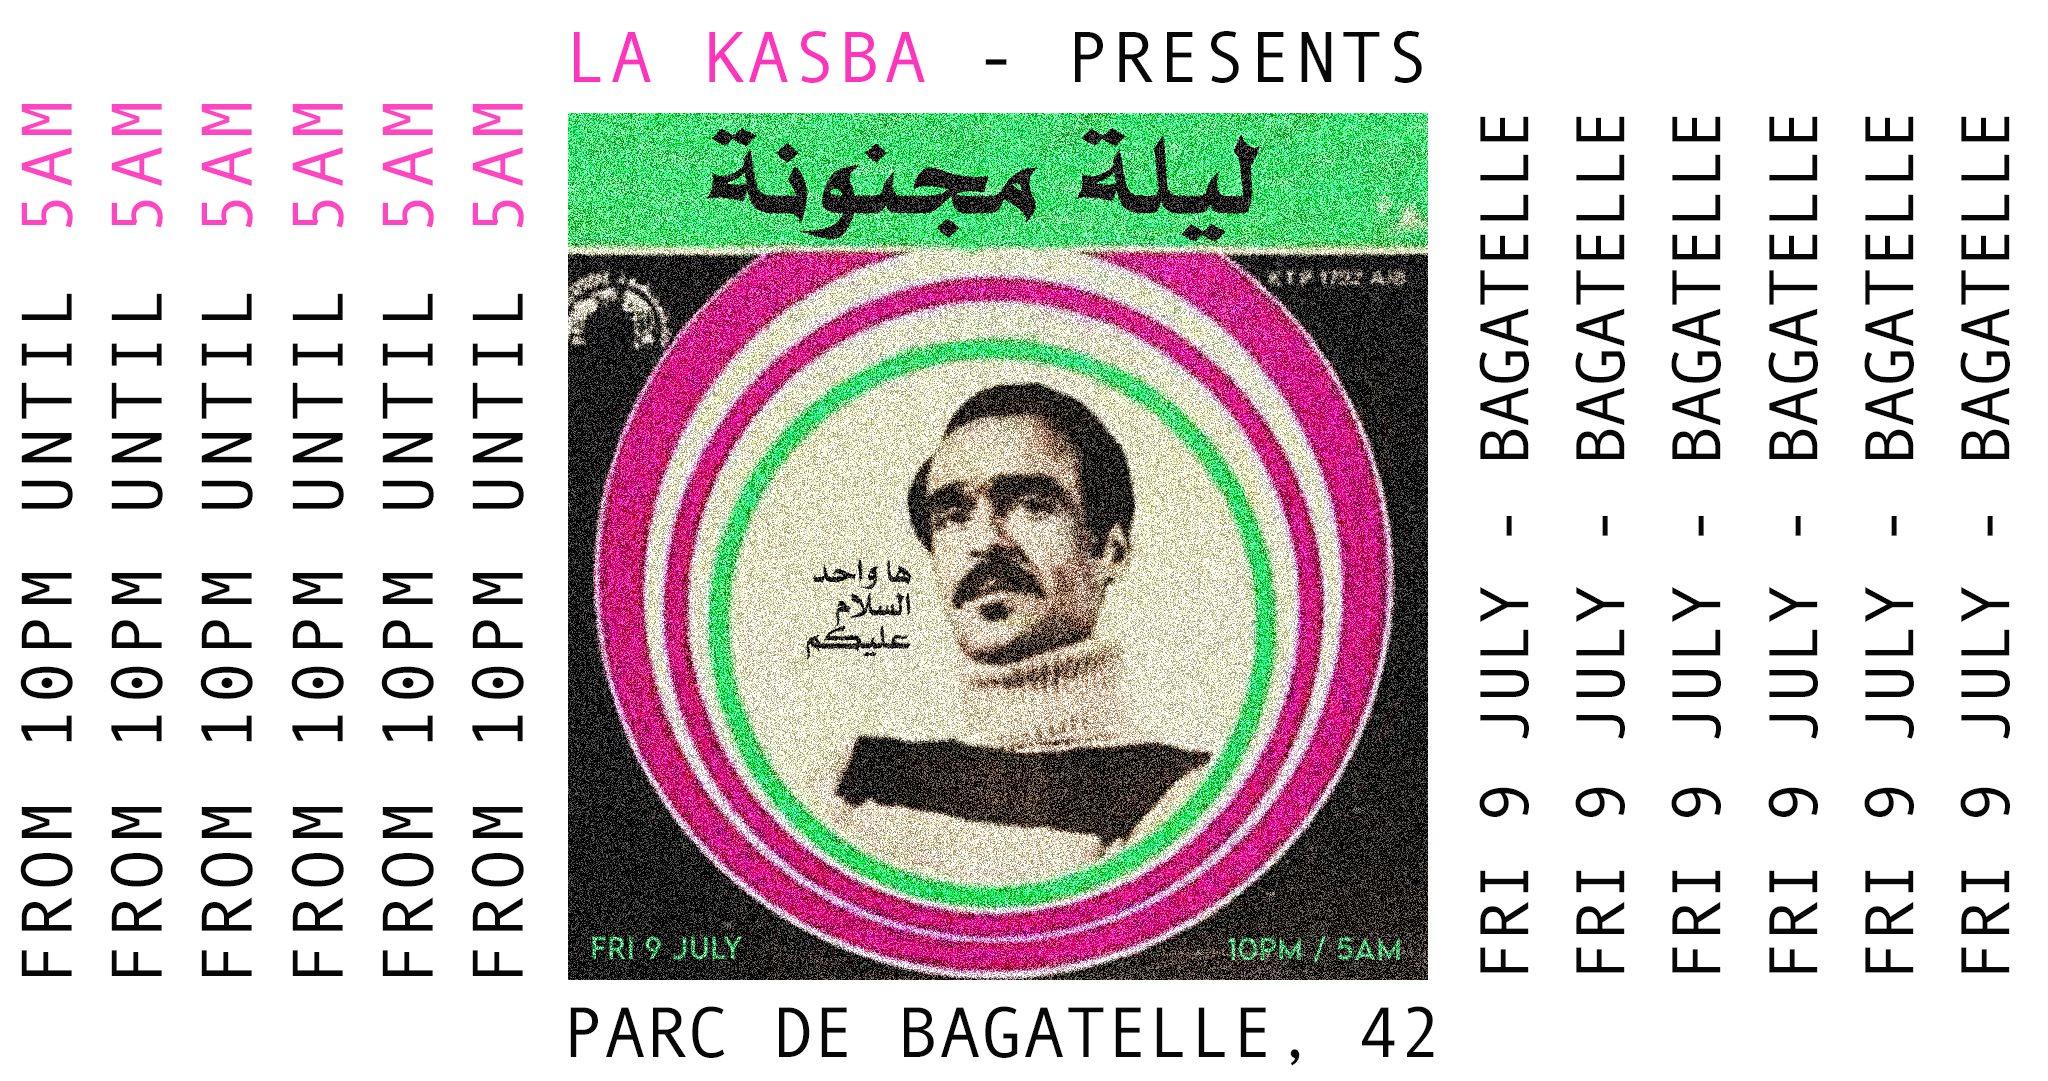 La Kasba - PARC DE BAGATELLE 42